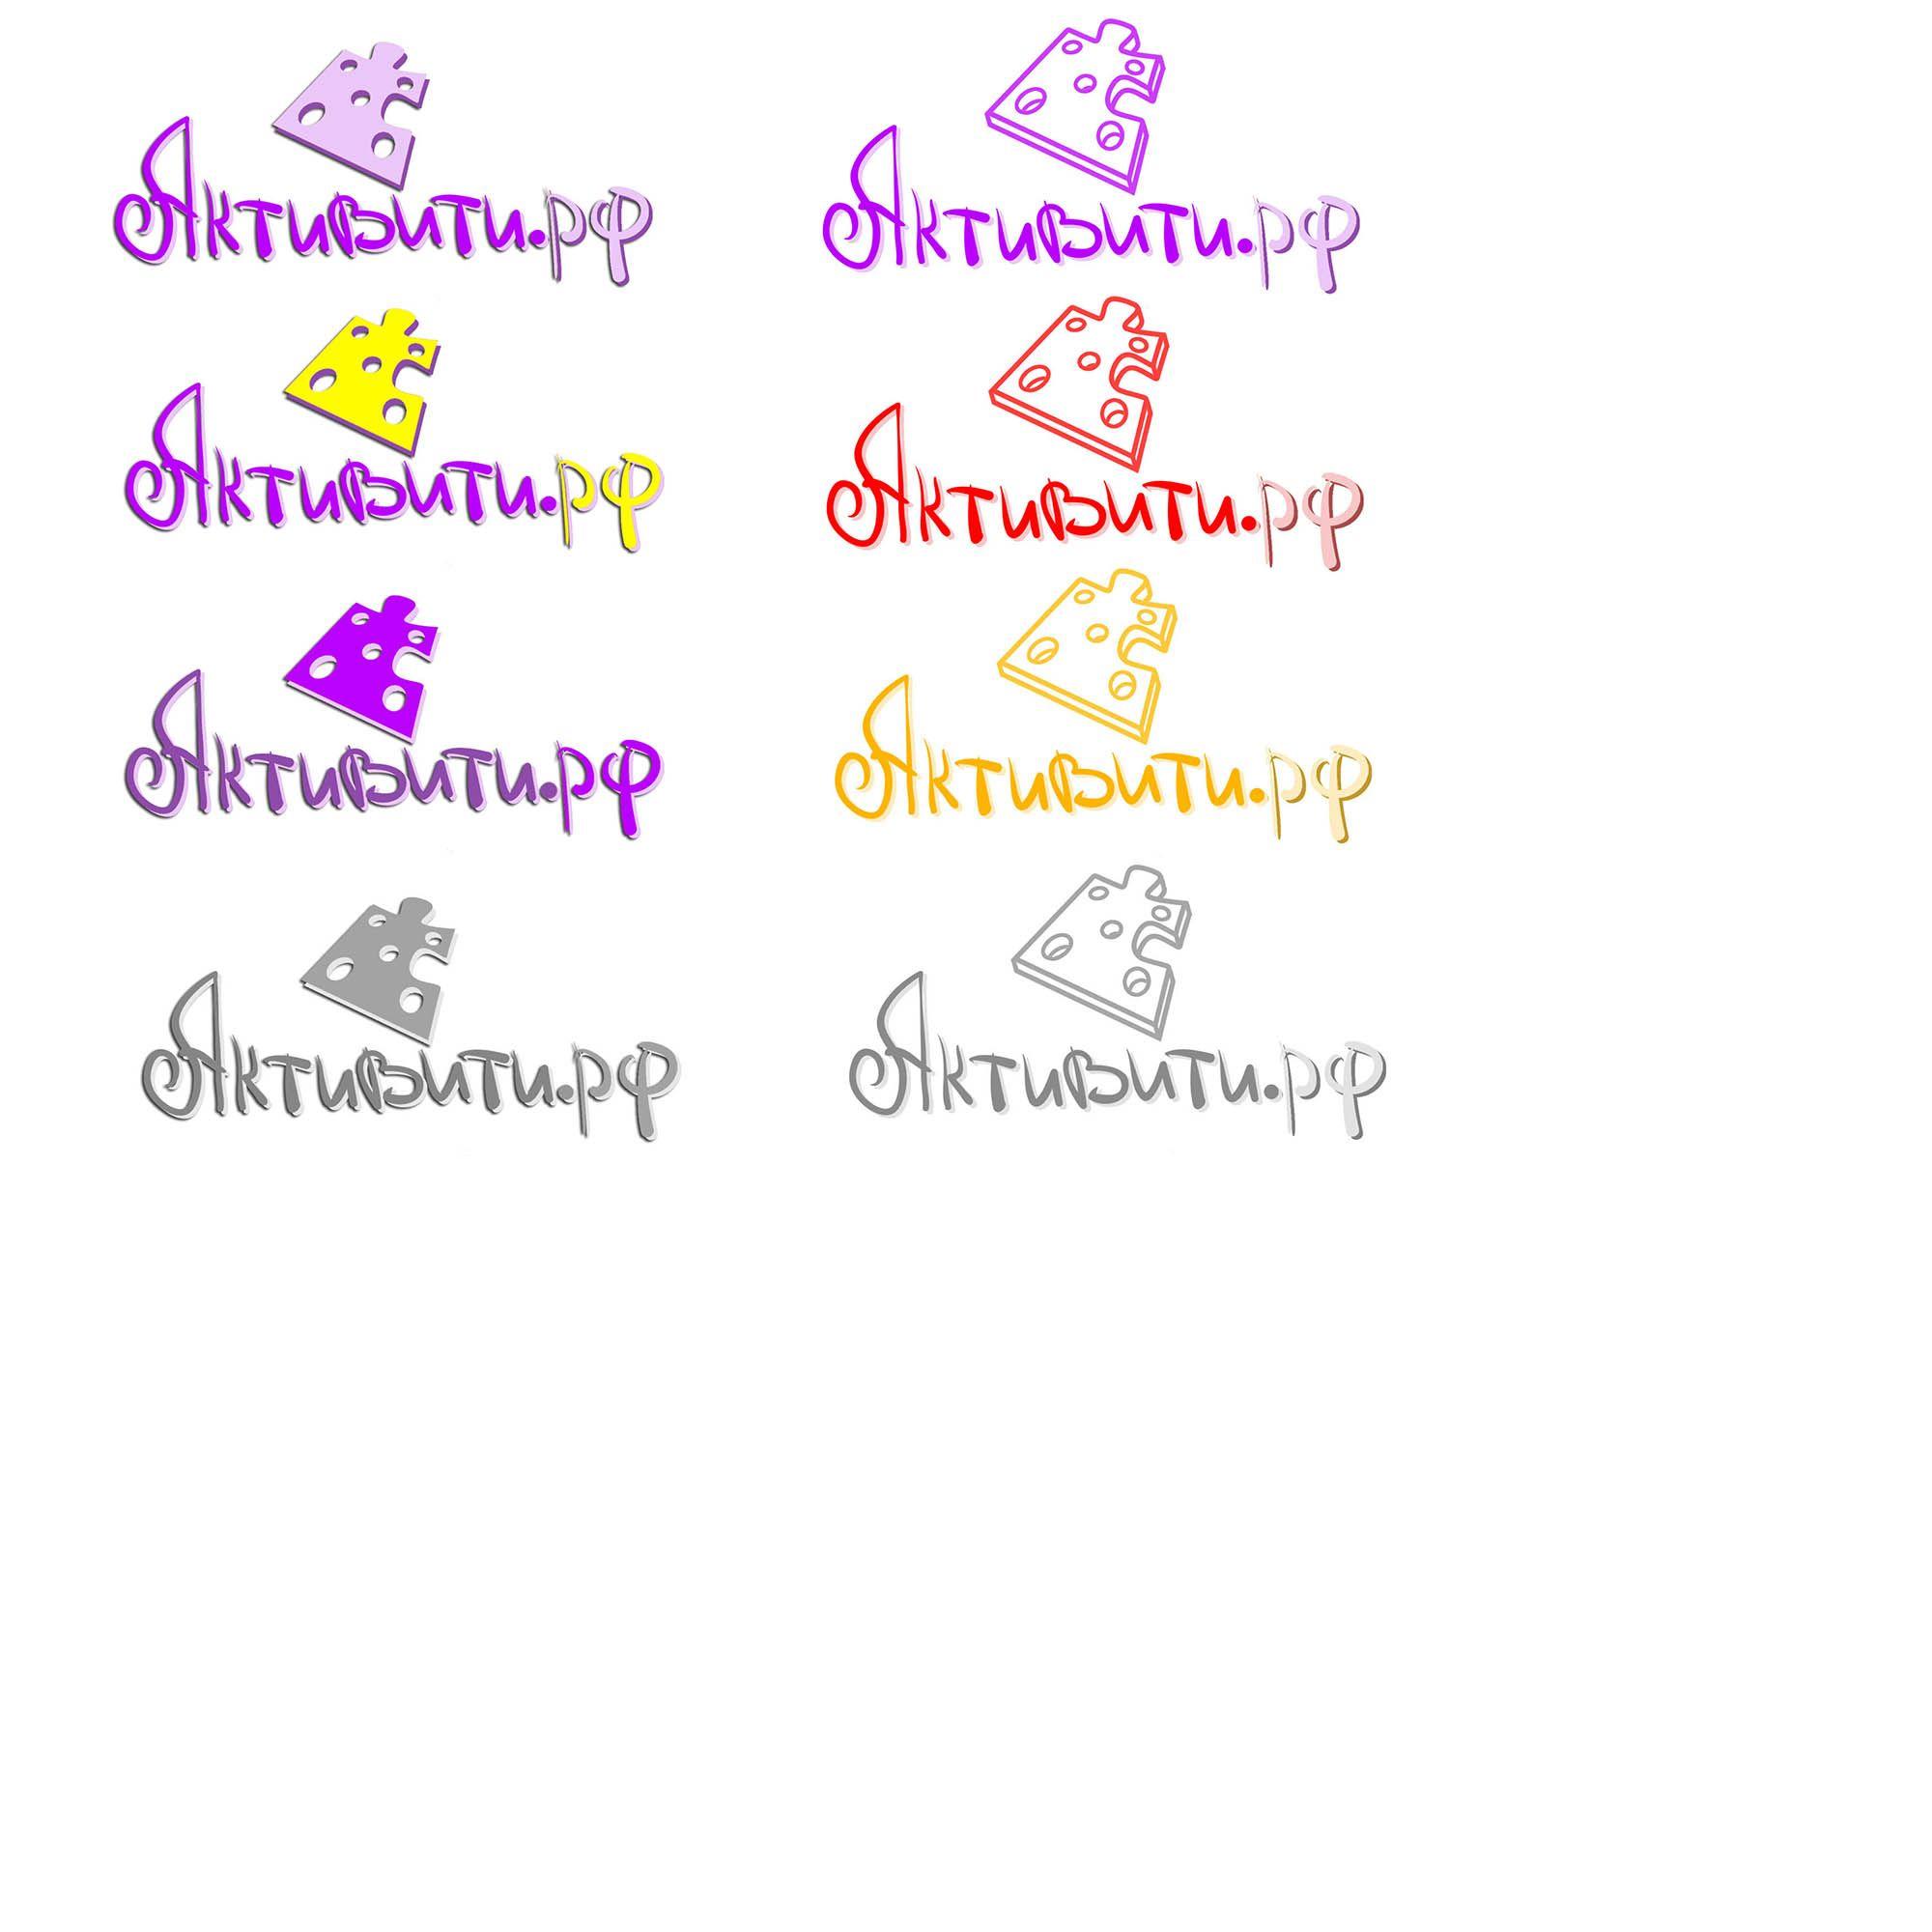 Логотип магазина активити.рф - дизайнер Kannabi5